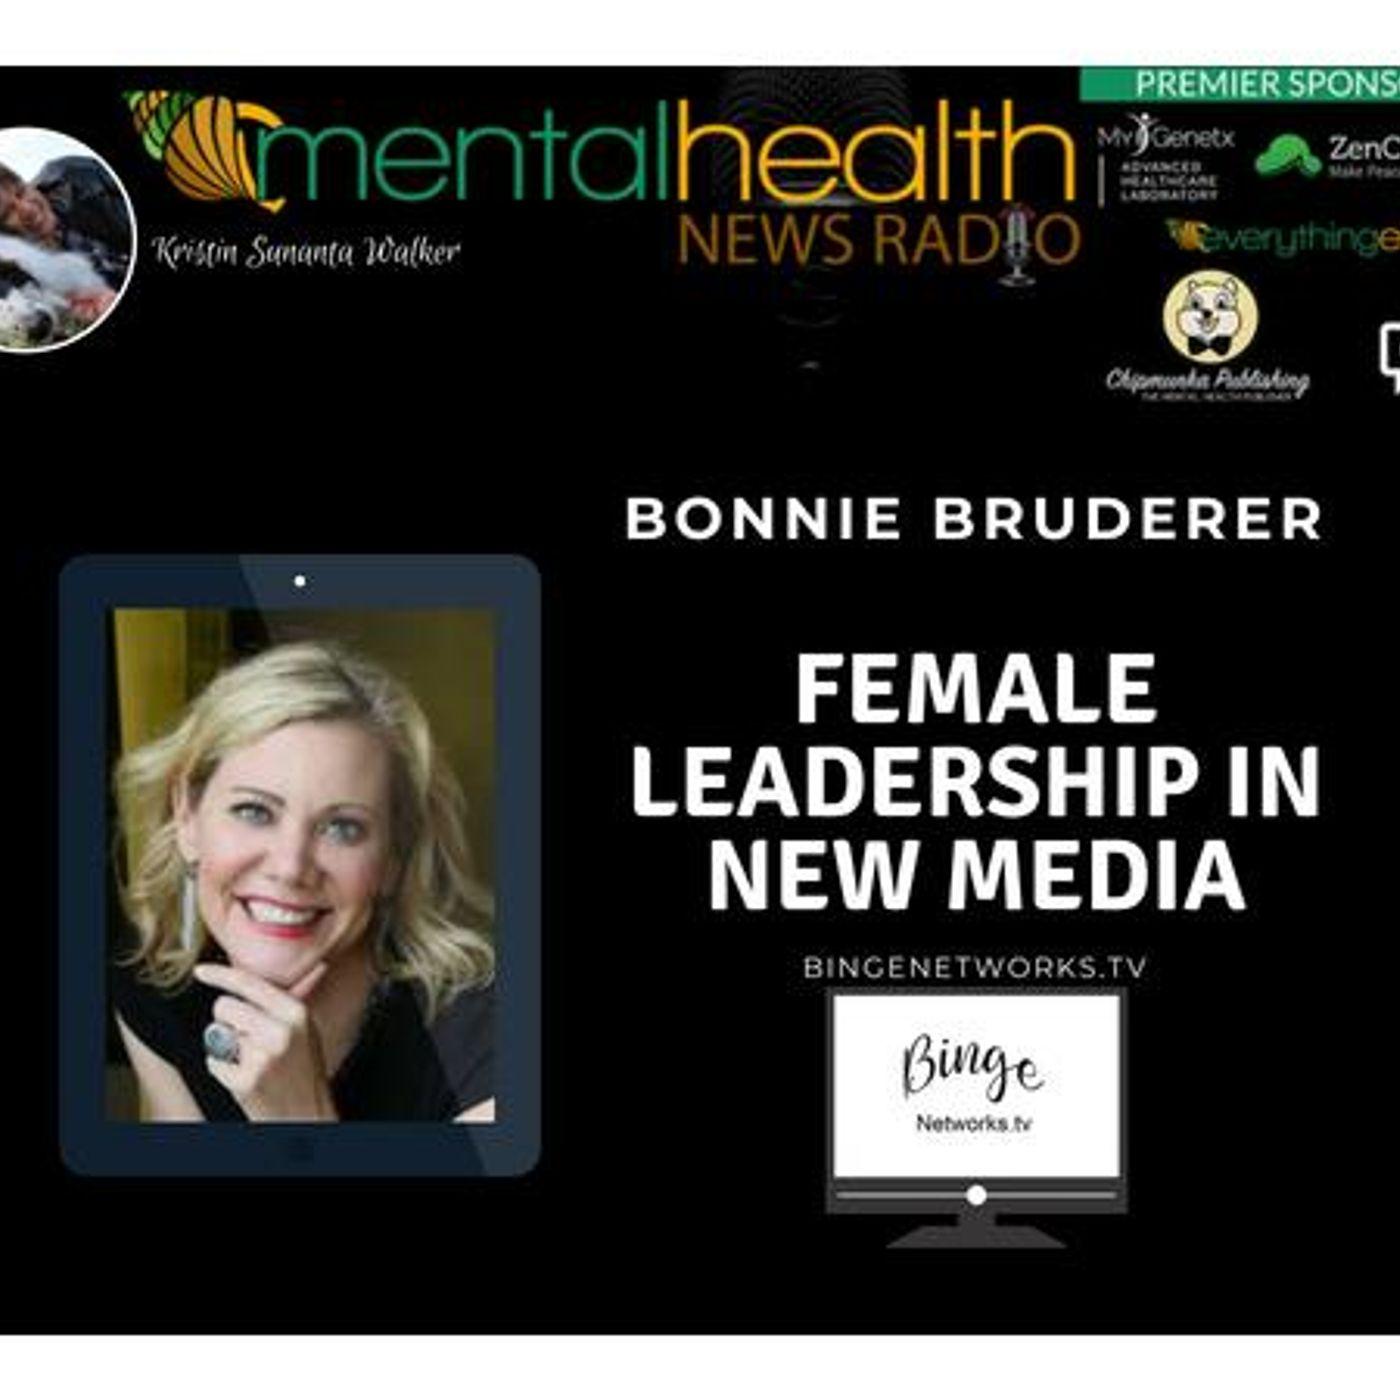 Mental Health News Radio - Female Leadership in New Media: Binge Networks TV Founder Bonnie Bruderer